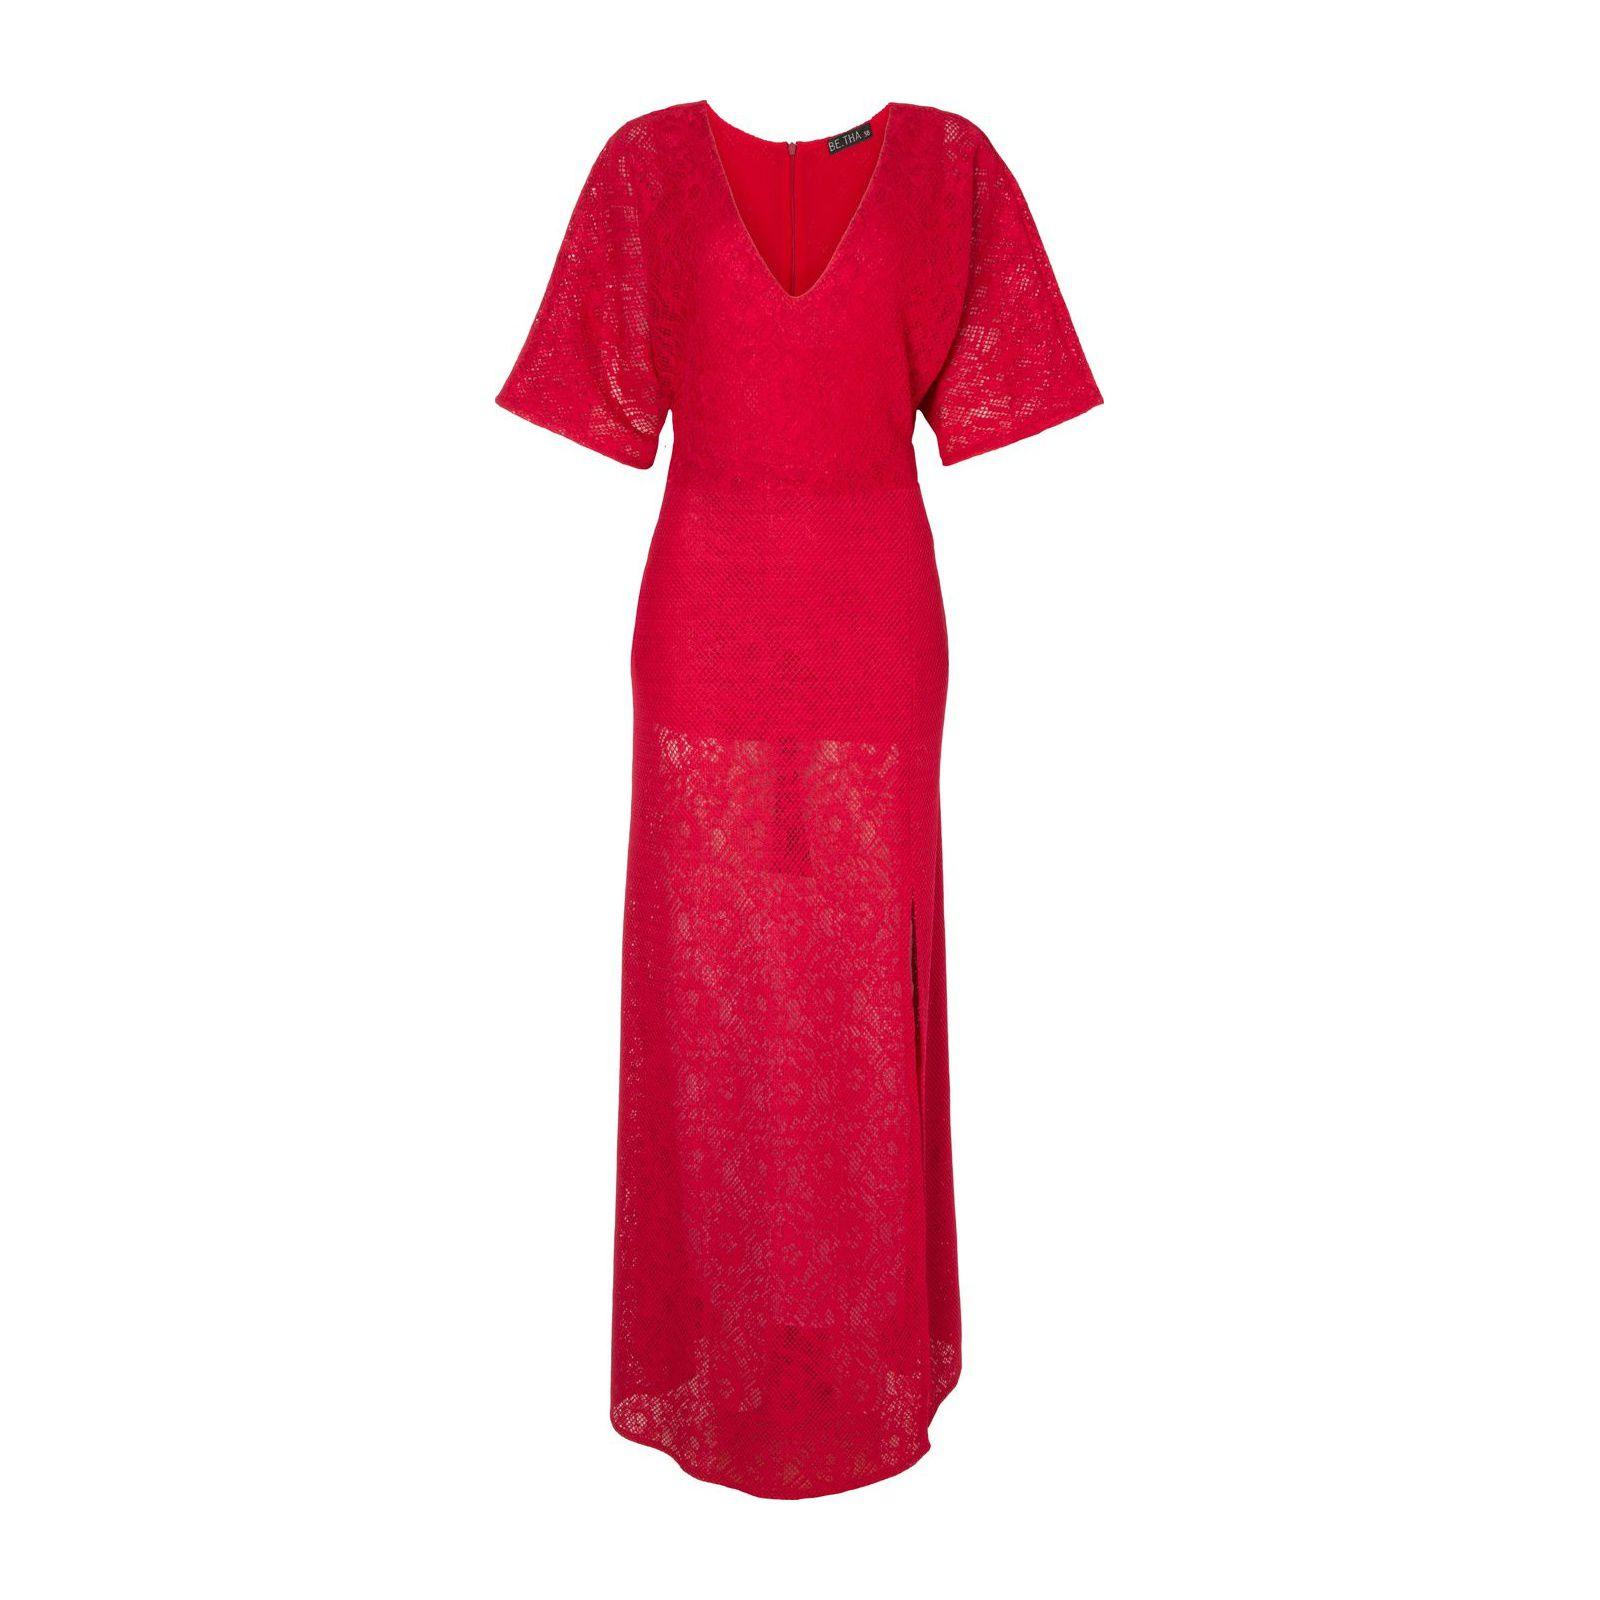 Vestido Longo Renda Cherry - Vermelho